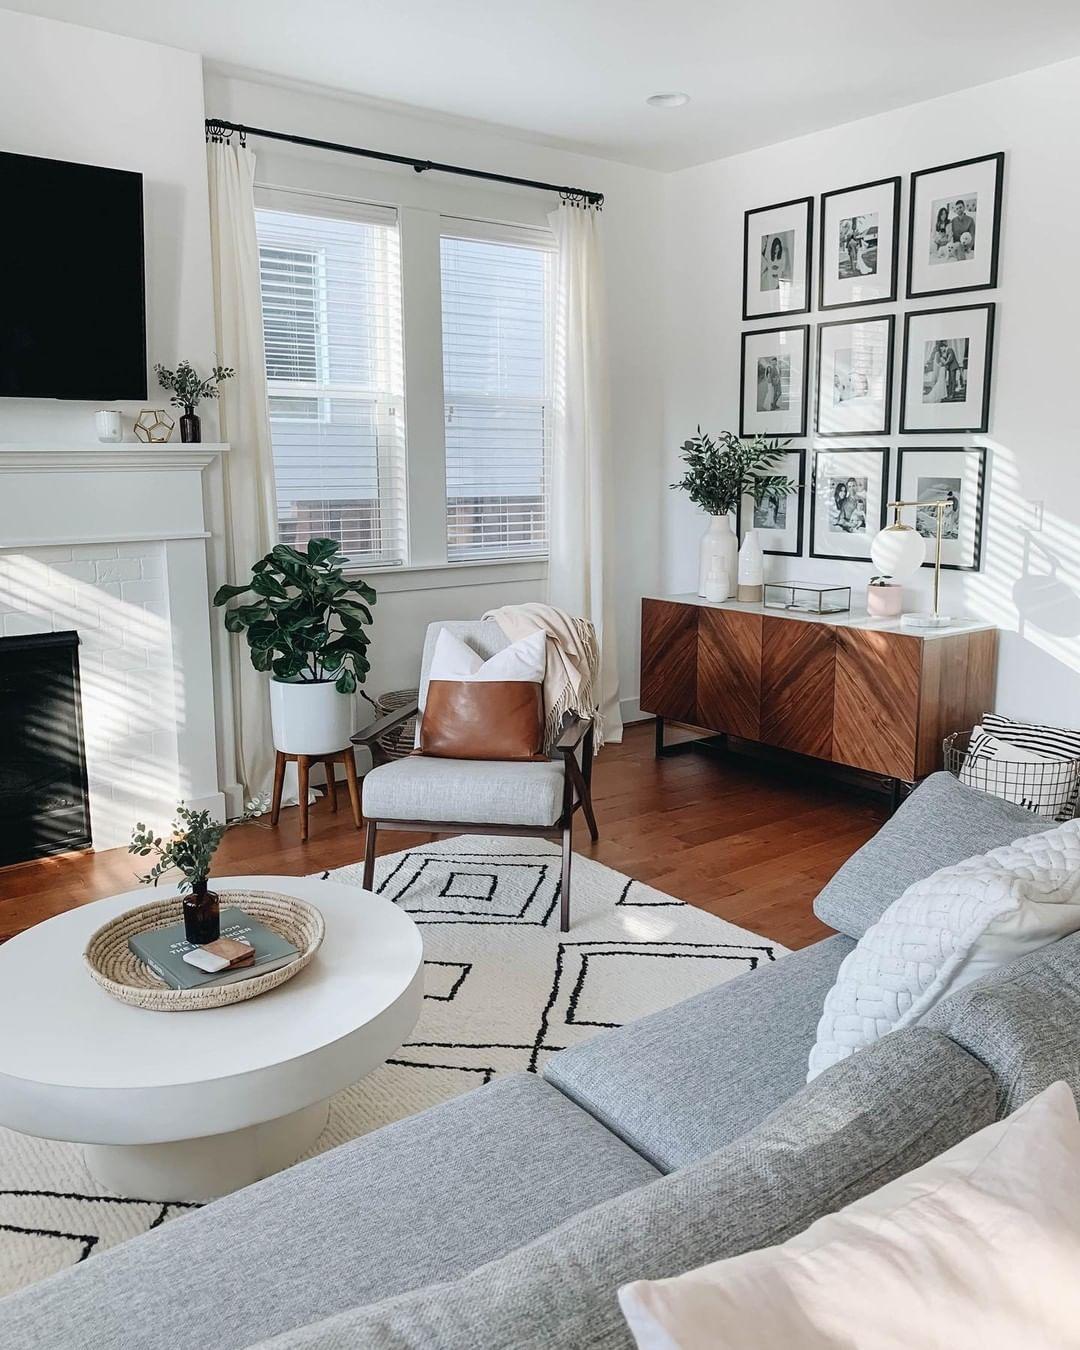 Ltkhome On Instagram Mid Century Modern Living Room Details Care